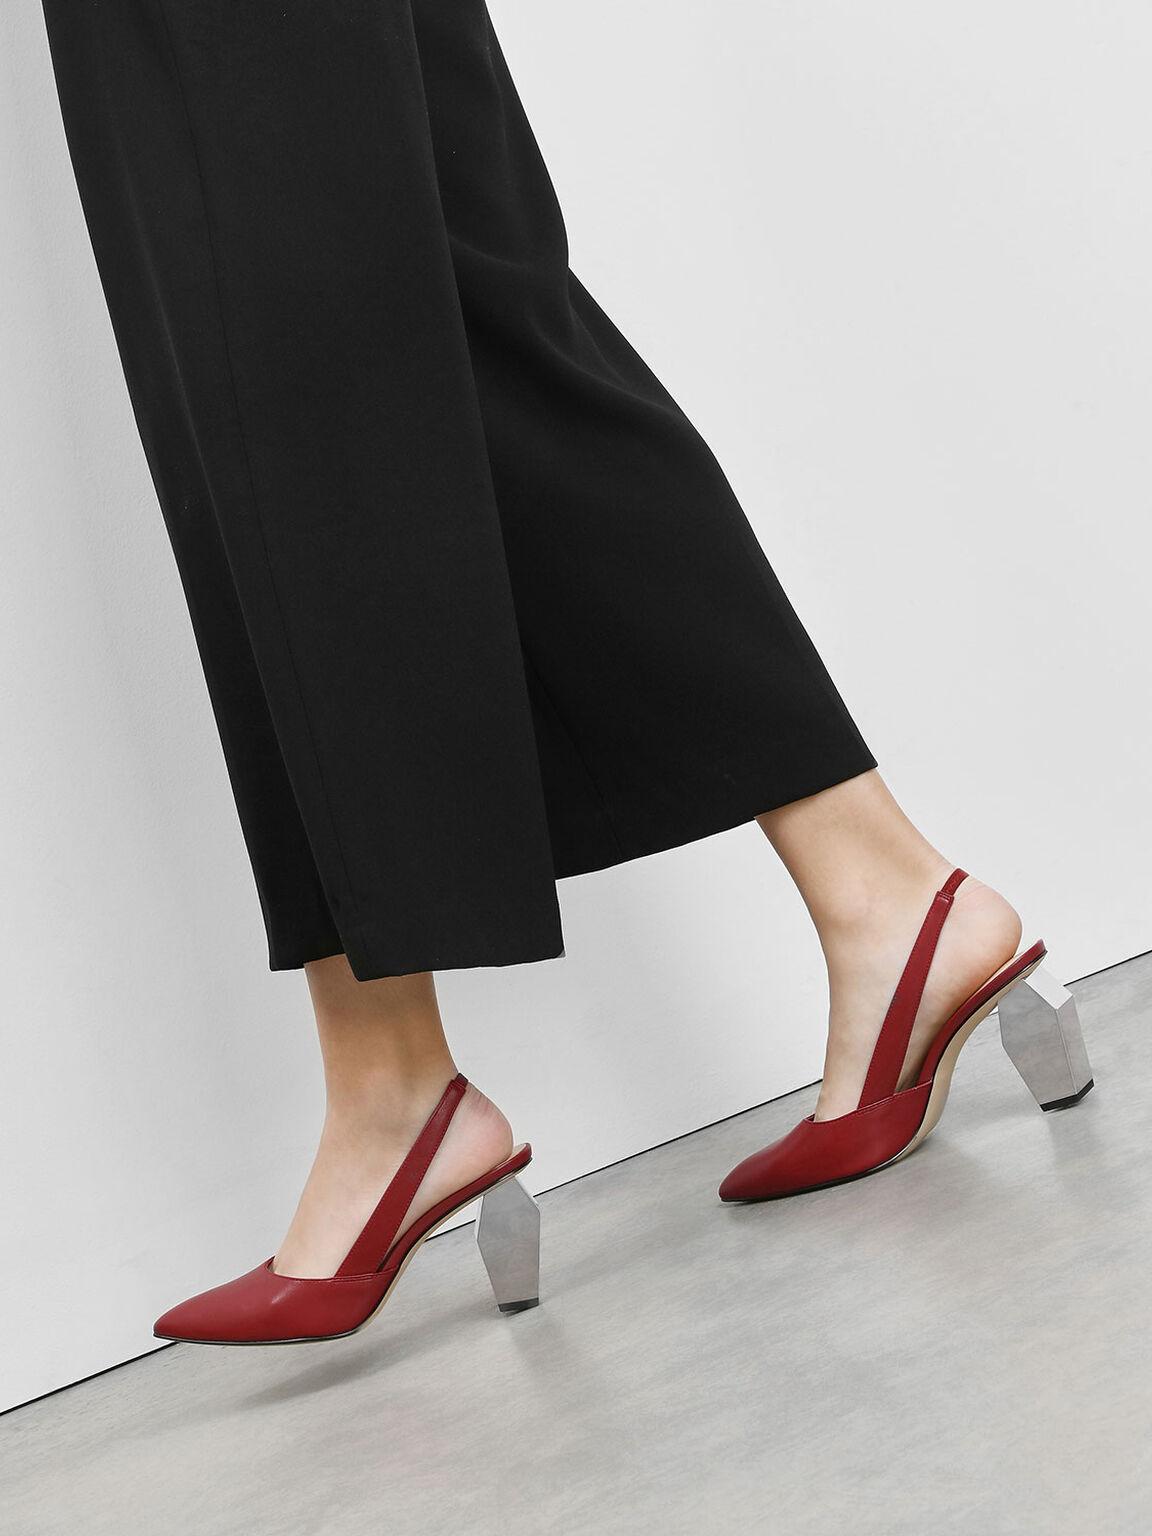 Geometric Chrome Heel Slingbacks, Red, hi-res